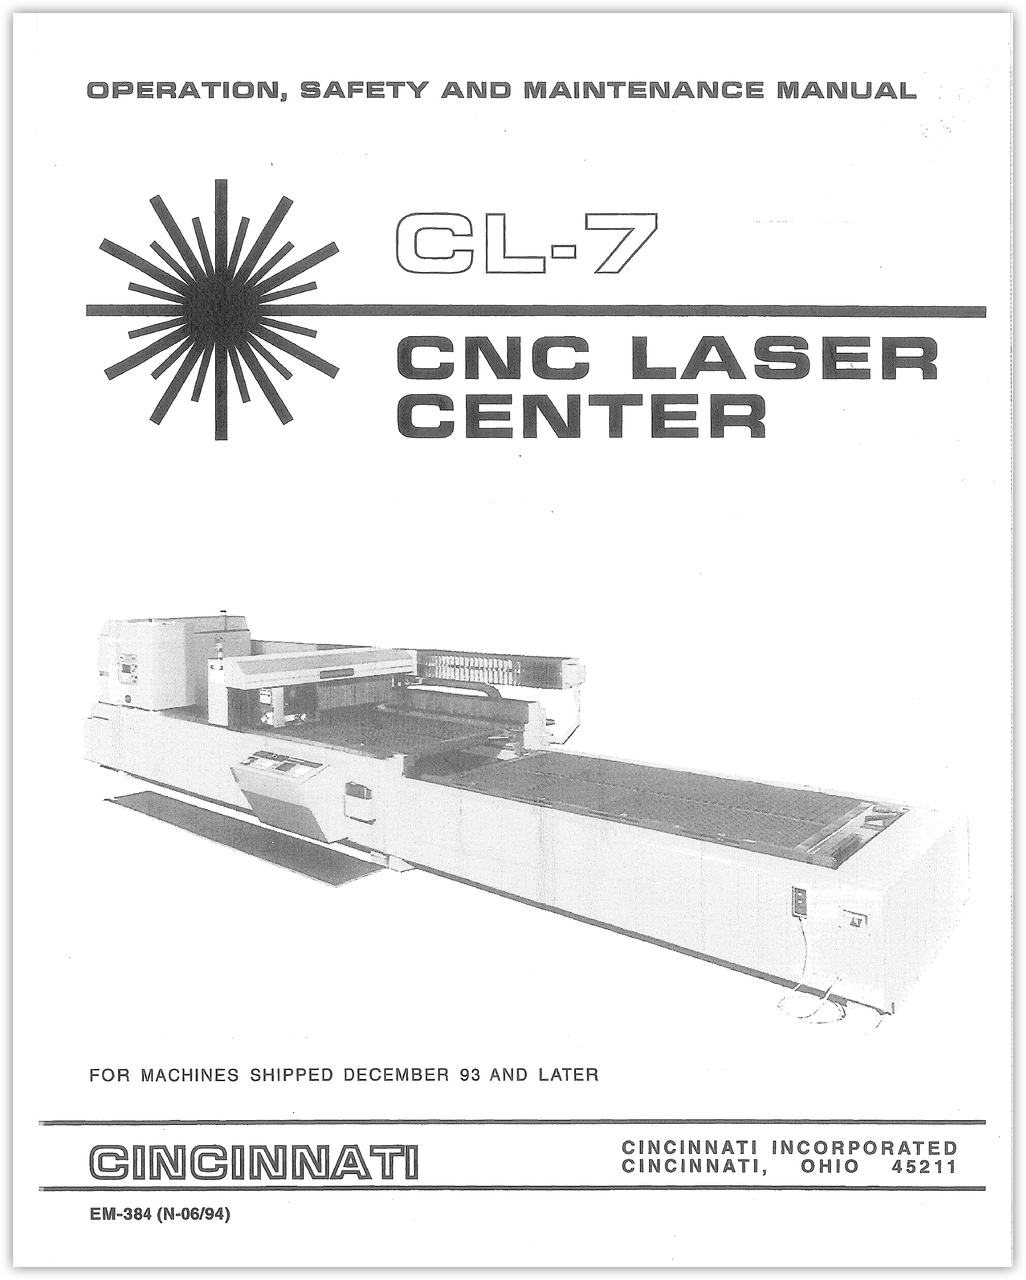 EM-384 (N-06-94) CL-7 CNC Laser Center - Machines Shipped December 1993 or later